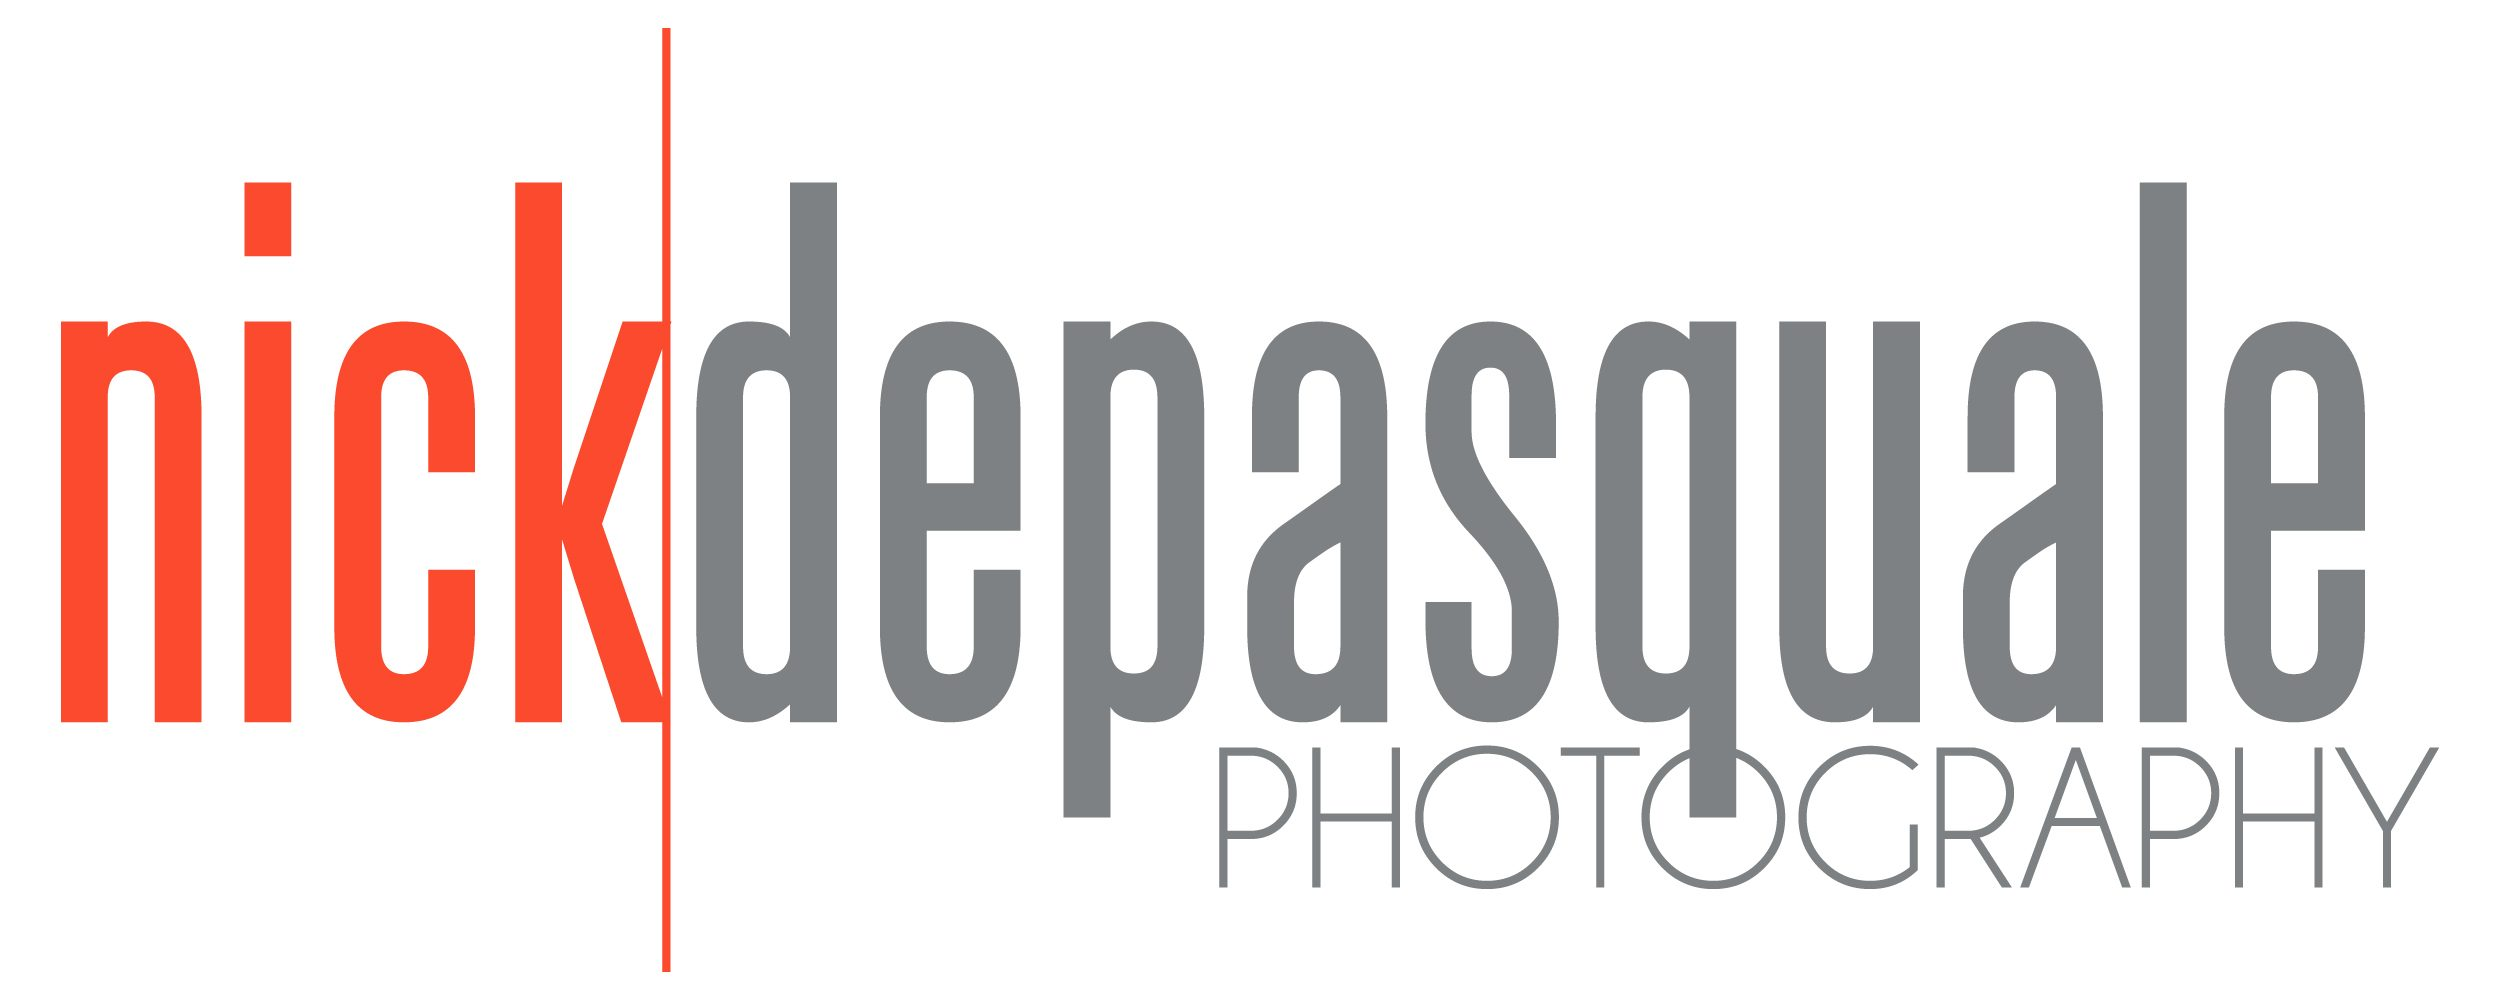 Nick DePasquale Photography